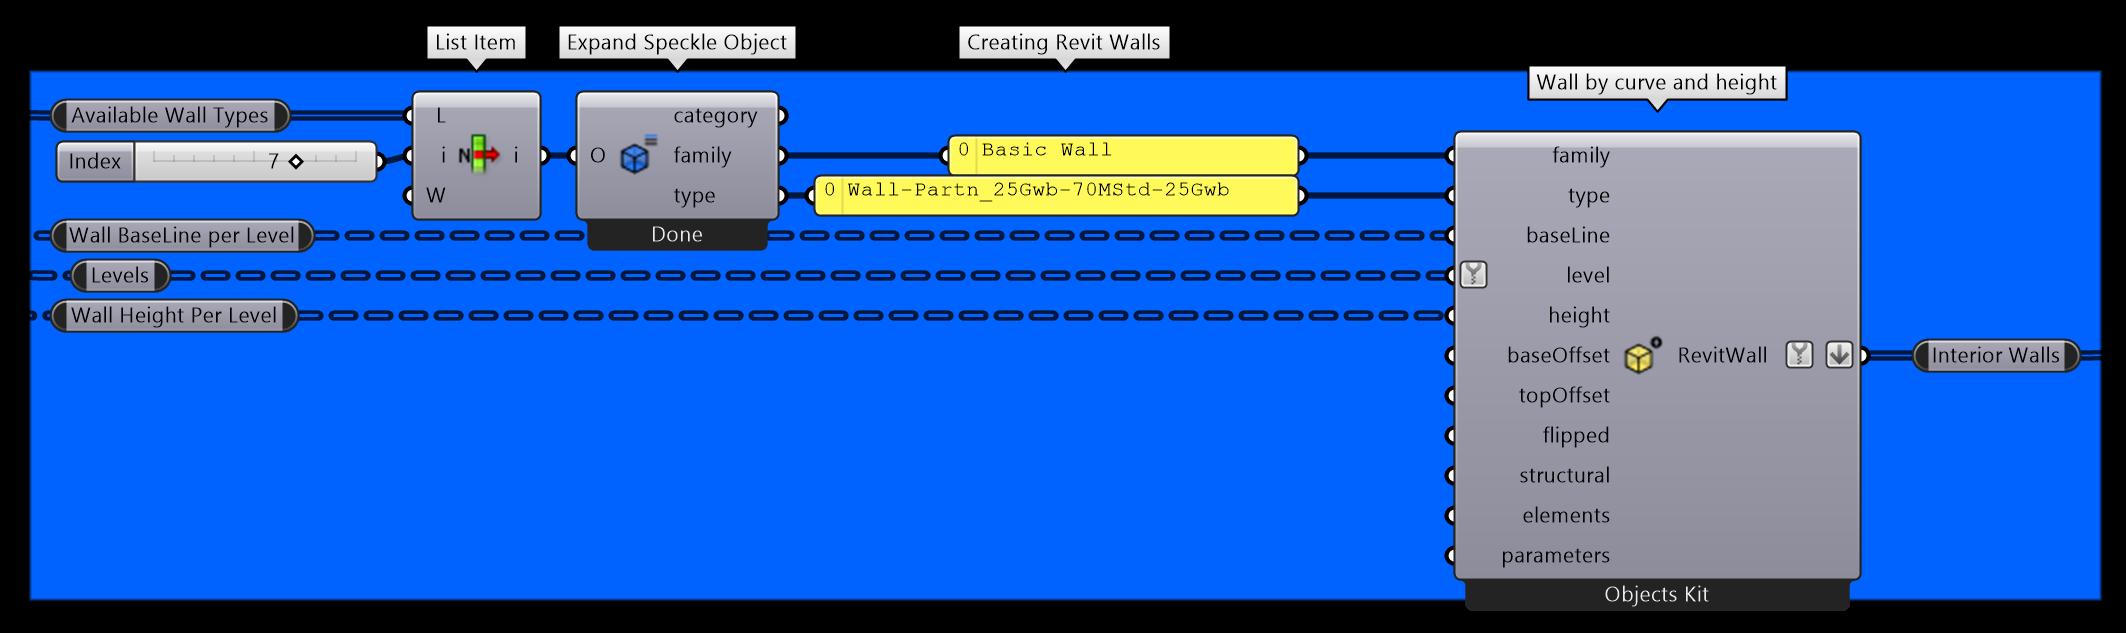 Create interior walls